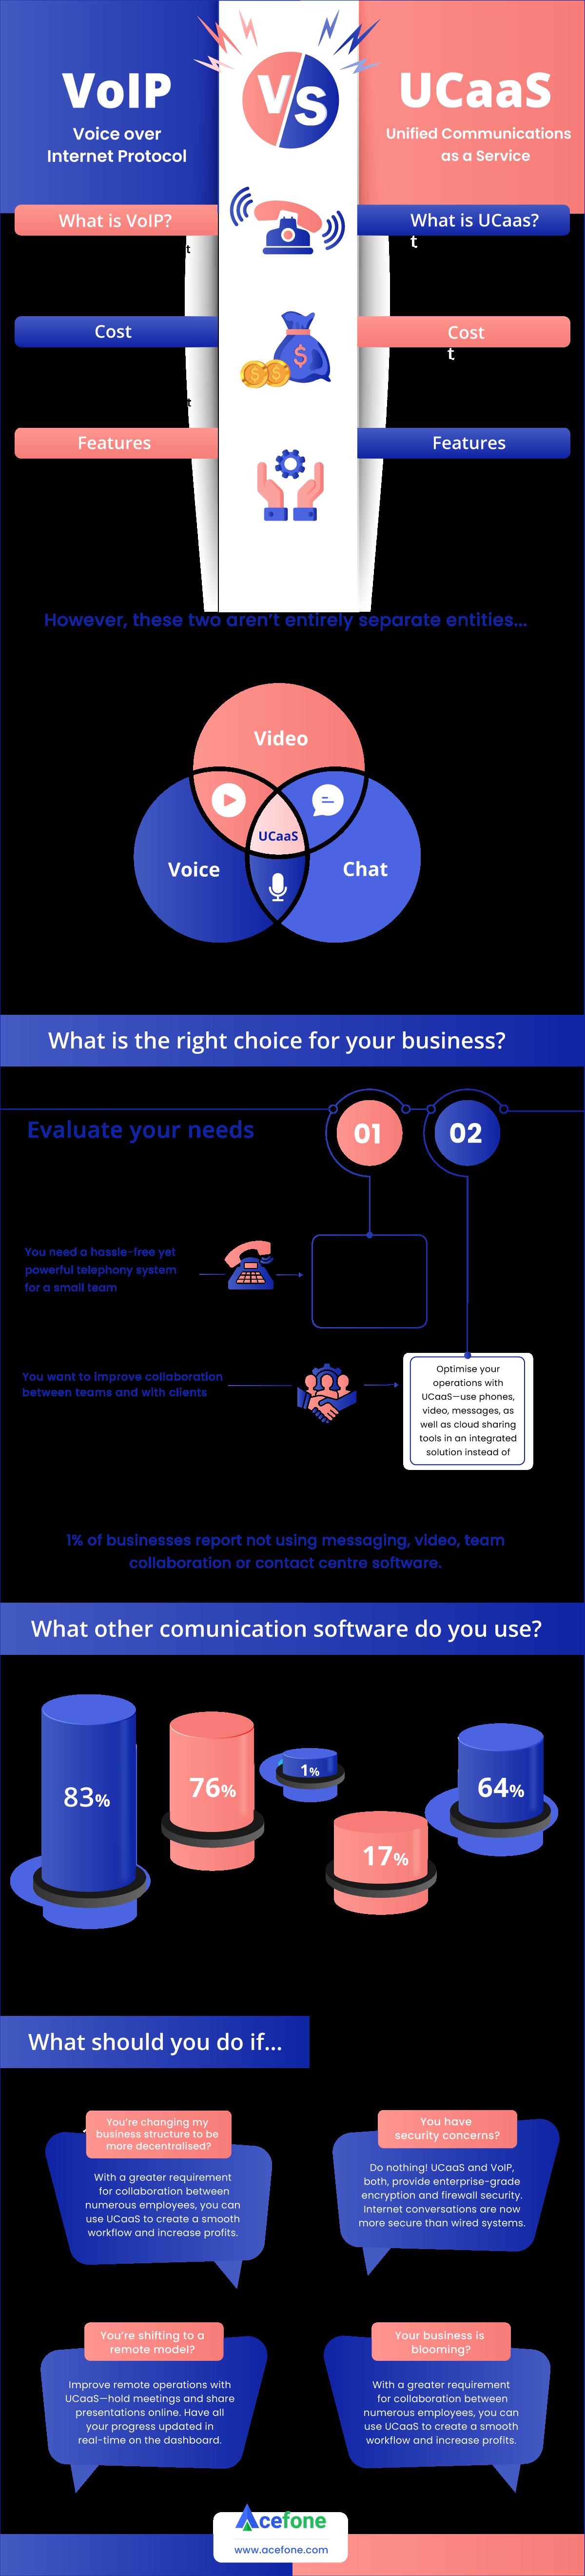 VoIP vs UCaaS Infographic